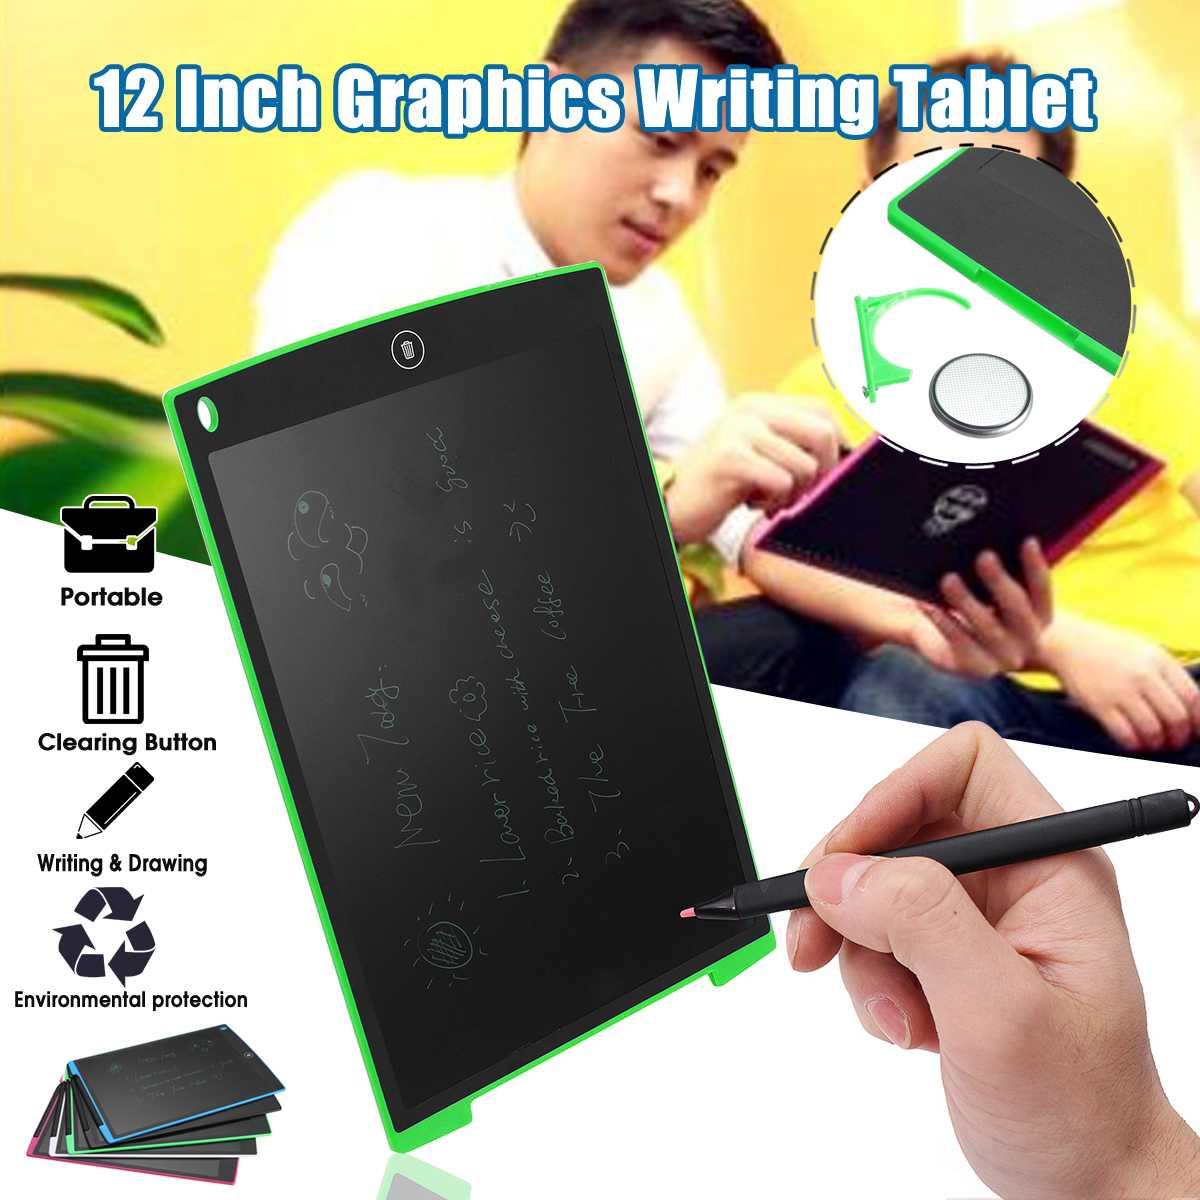 12 LCD Escrita Tablet Almofadas para Placas de Estilo Boogie Board Jot eWriter LCD Teclado de Escrita Placa de Escrita para Crianças Dos Miúdos Presentes